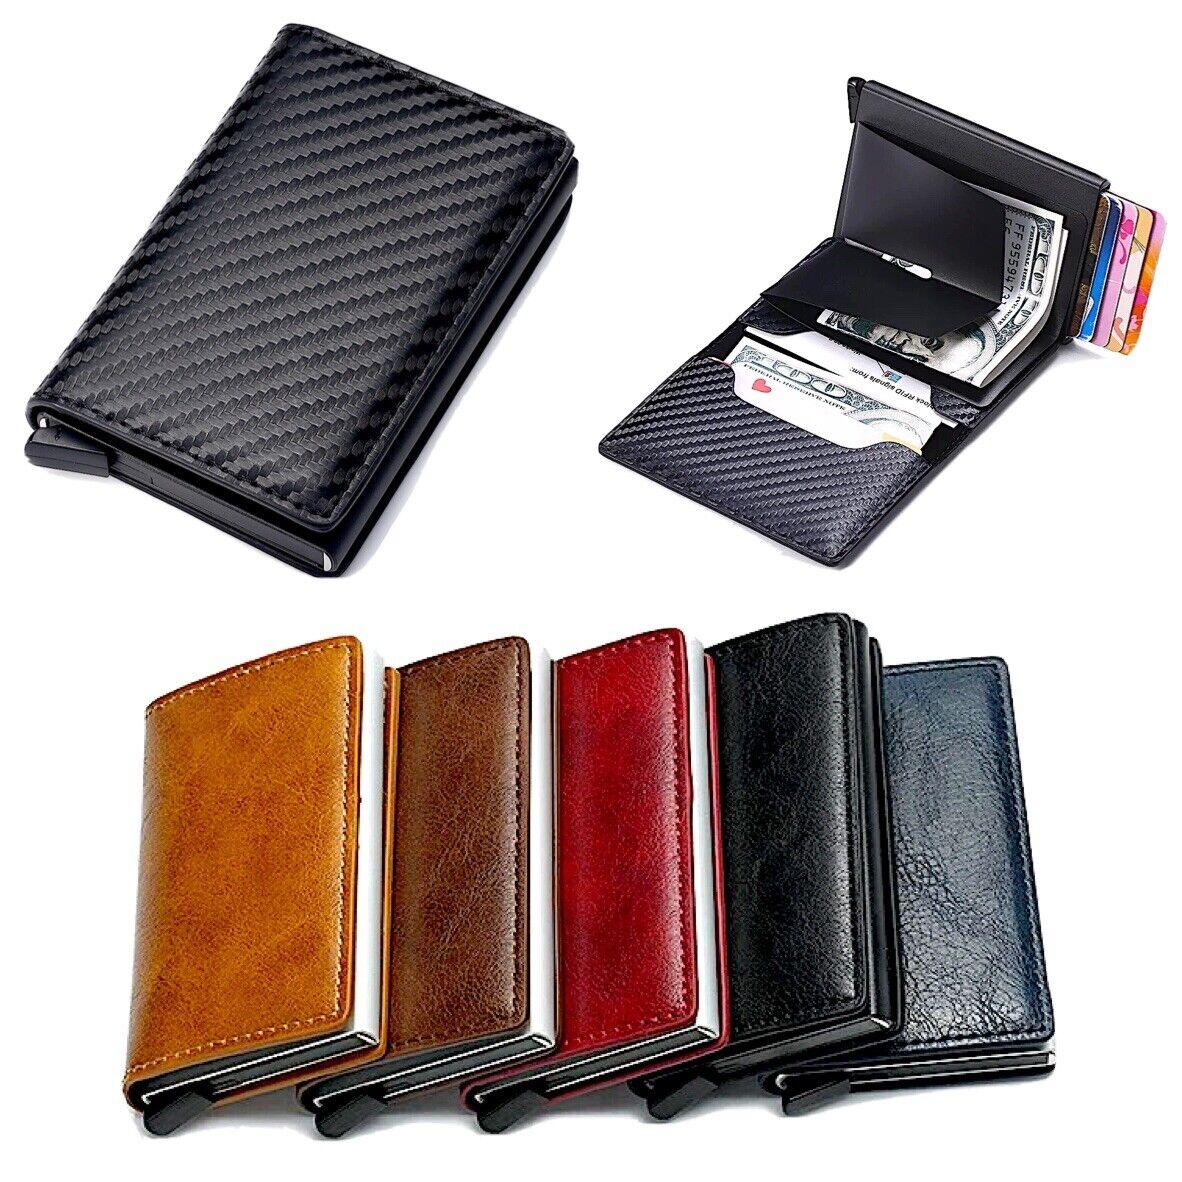 Mens RFID Blocking Leather Credit Card ID Holder Wallet Slim Money Clip Purse